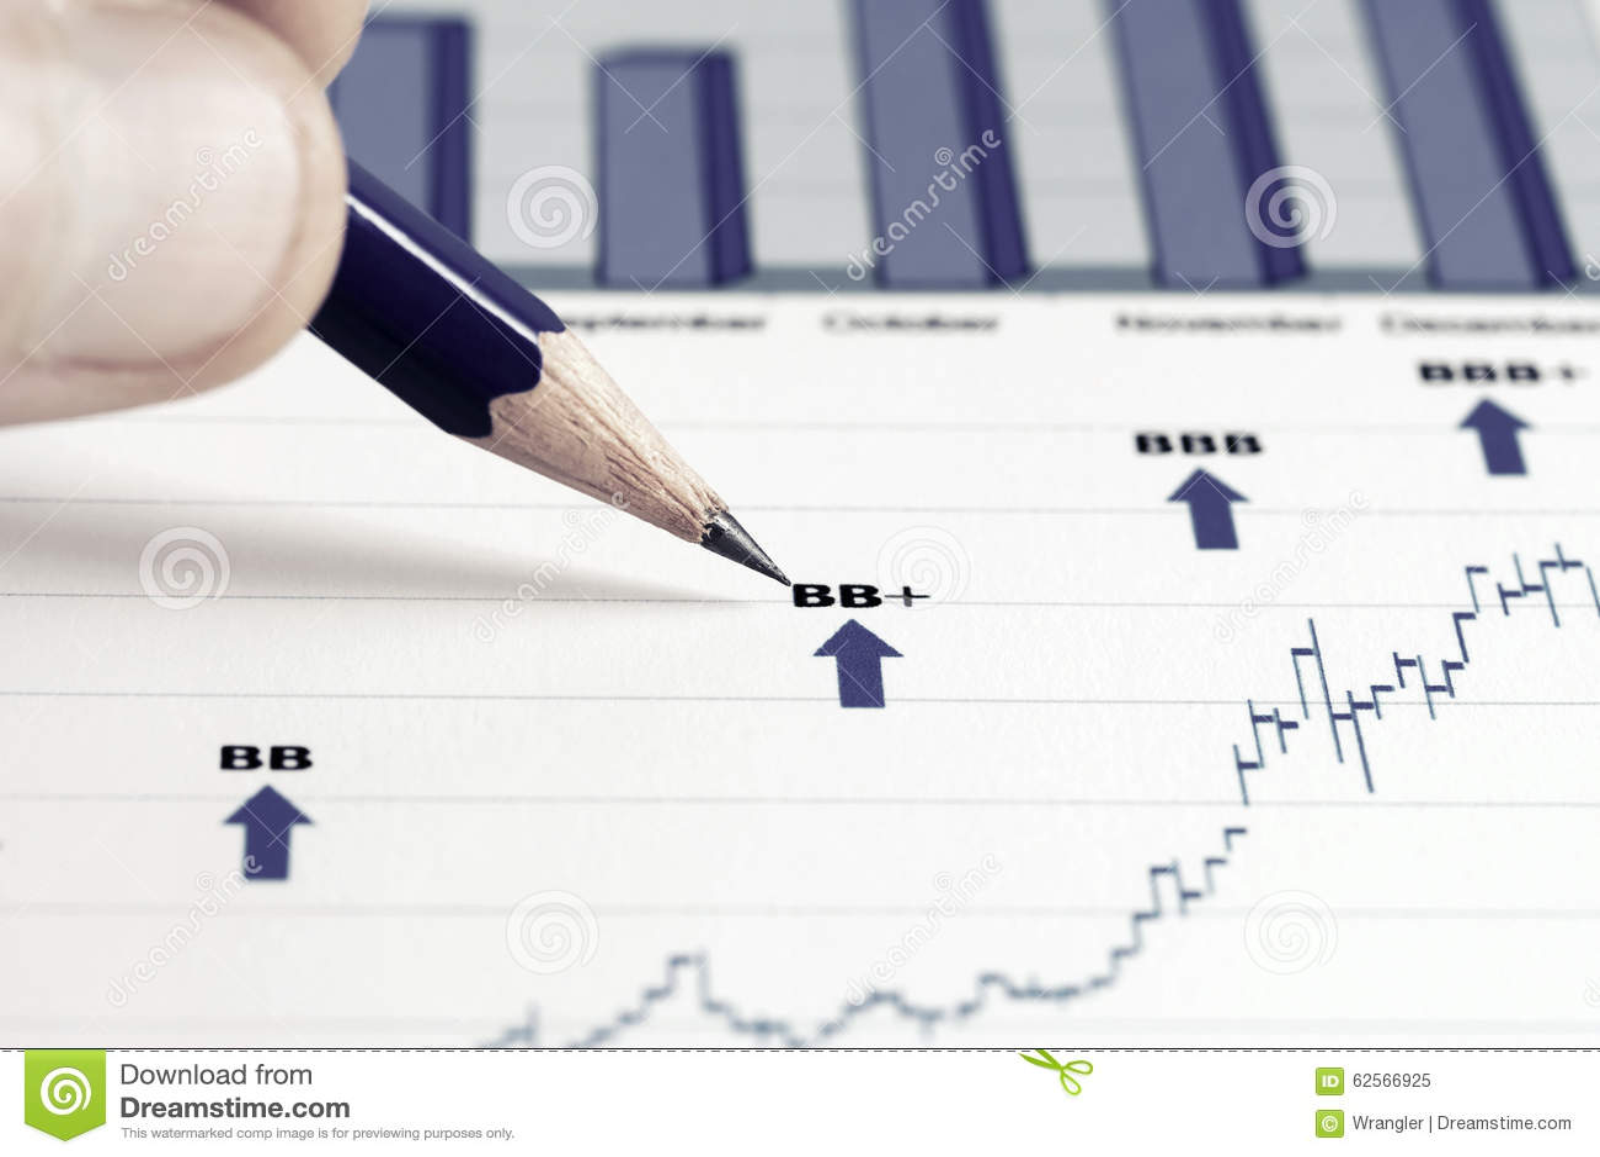 Sectors & Industries Overview